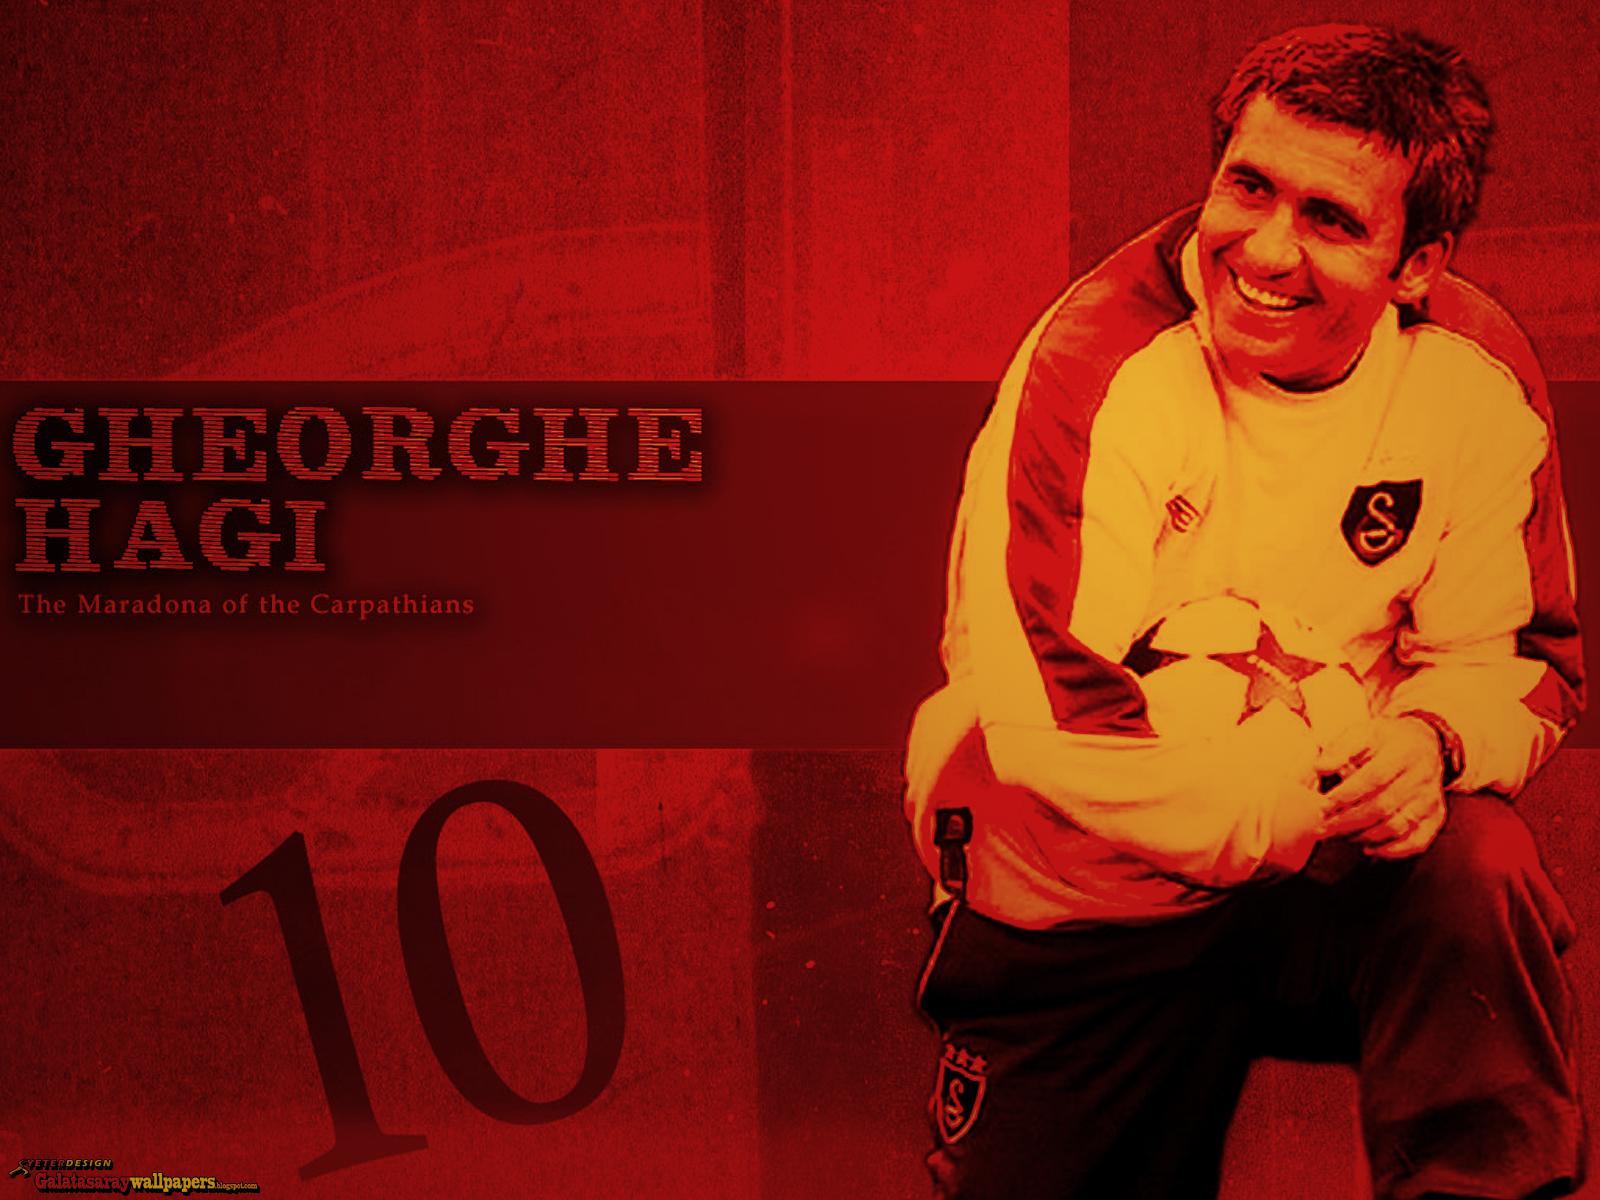 http://4.bp.blogspot.com/_1_qHrQBPgHE/TMWjWRNbKhI/AAAAAAAABI8/PzTqGGGbJ90/s1600/Gheorghe+Hagi+-+The+Maradona+of+the+Carpathians+GW+3.jpg